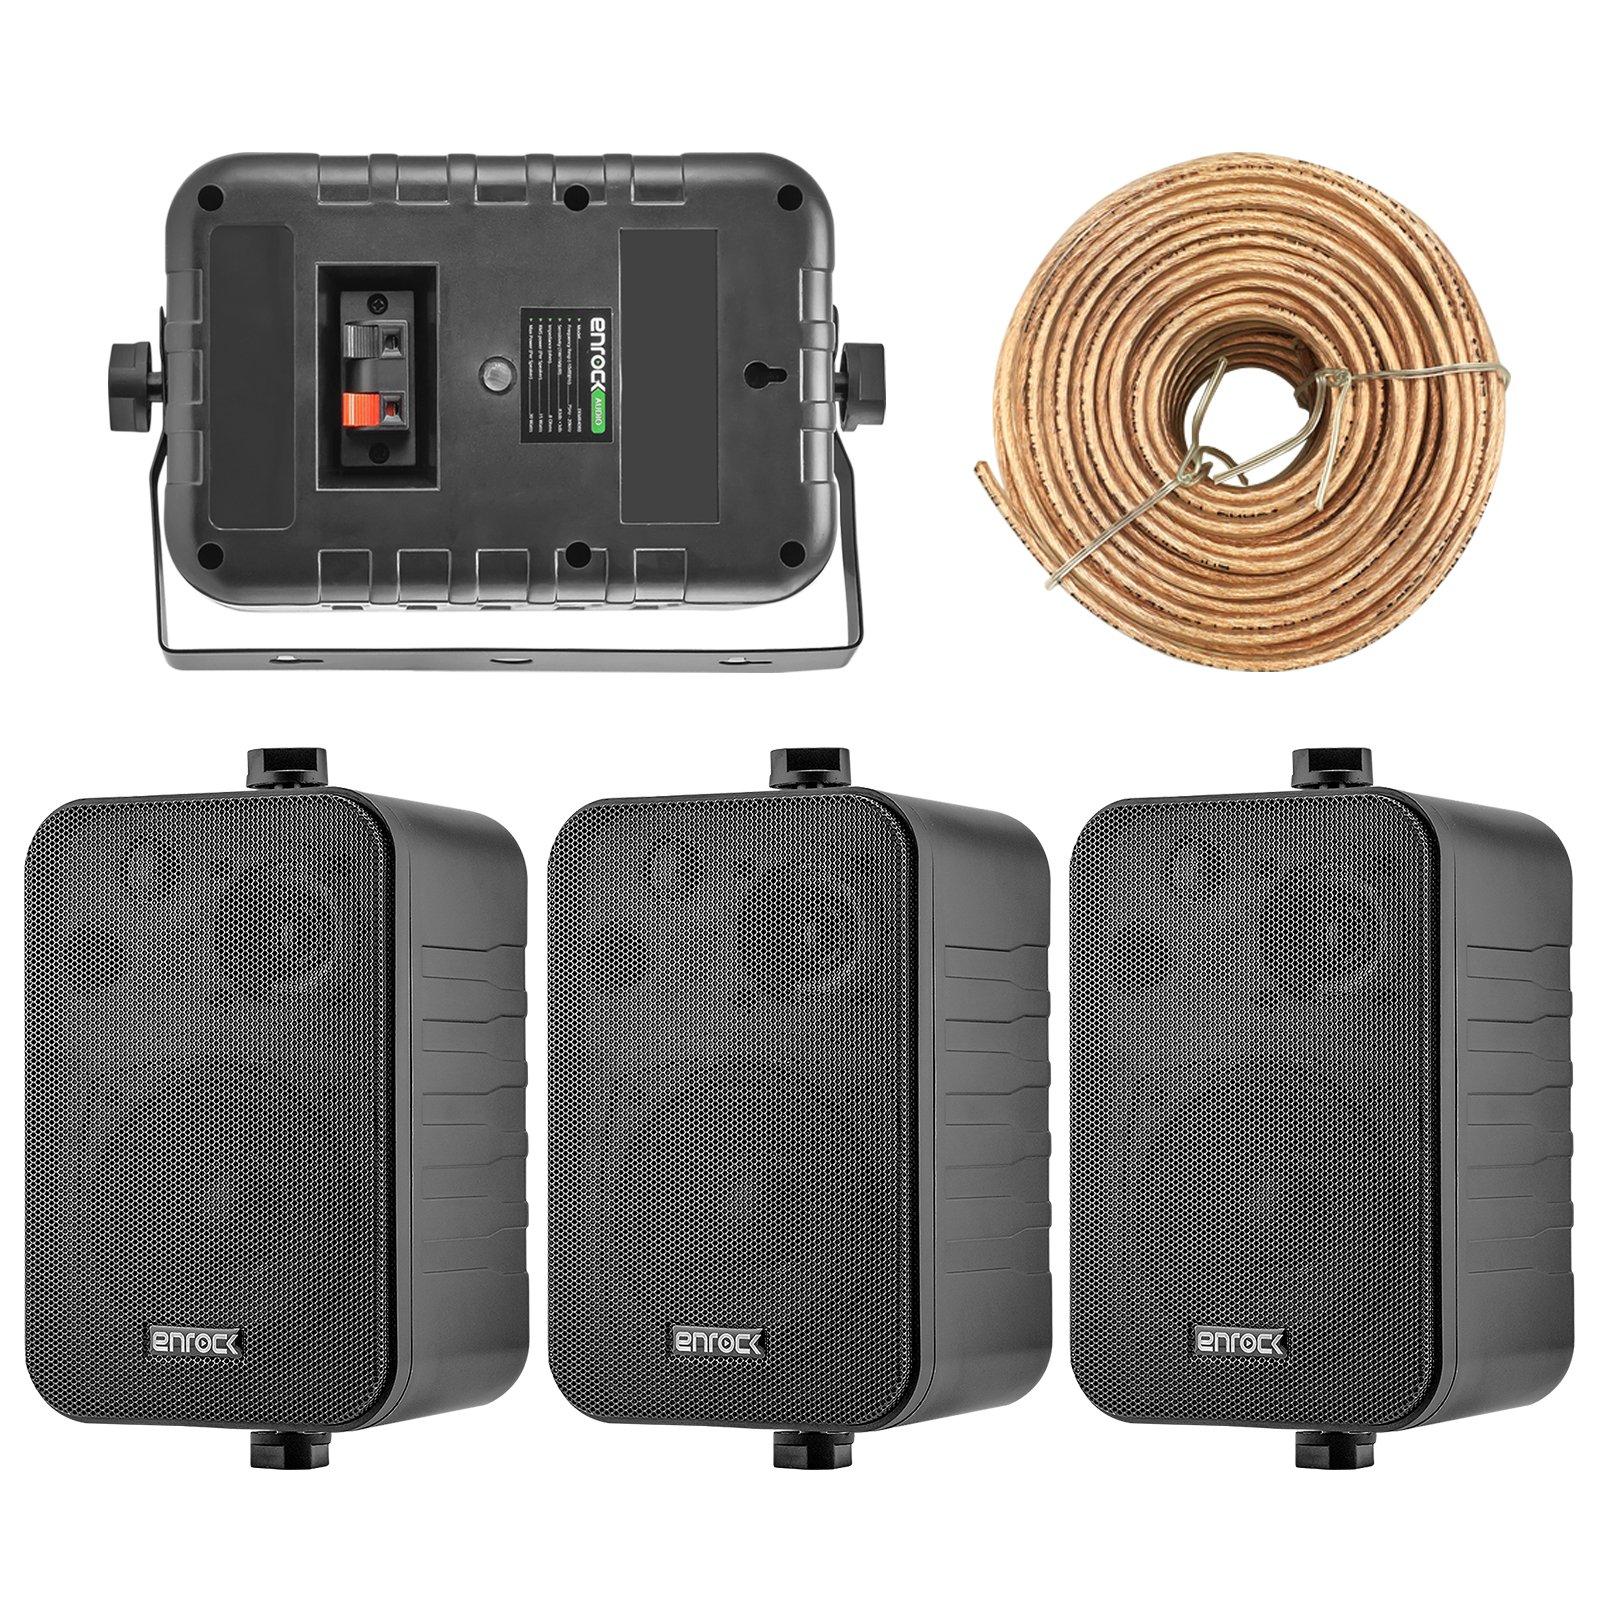 4x Speakers Bundle Package: 2 Pairs of Enrock Audio EKMR408B 4-Inch 200 Watts Black 3-Way Indoor / Outdoor Marine Boat Box-Speaker Combo With 50 Foot 18 Guage Speaker Wire